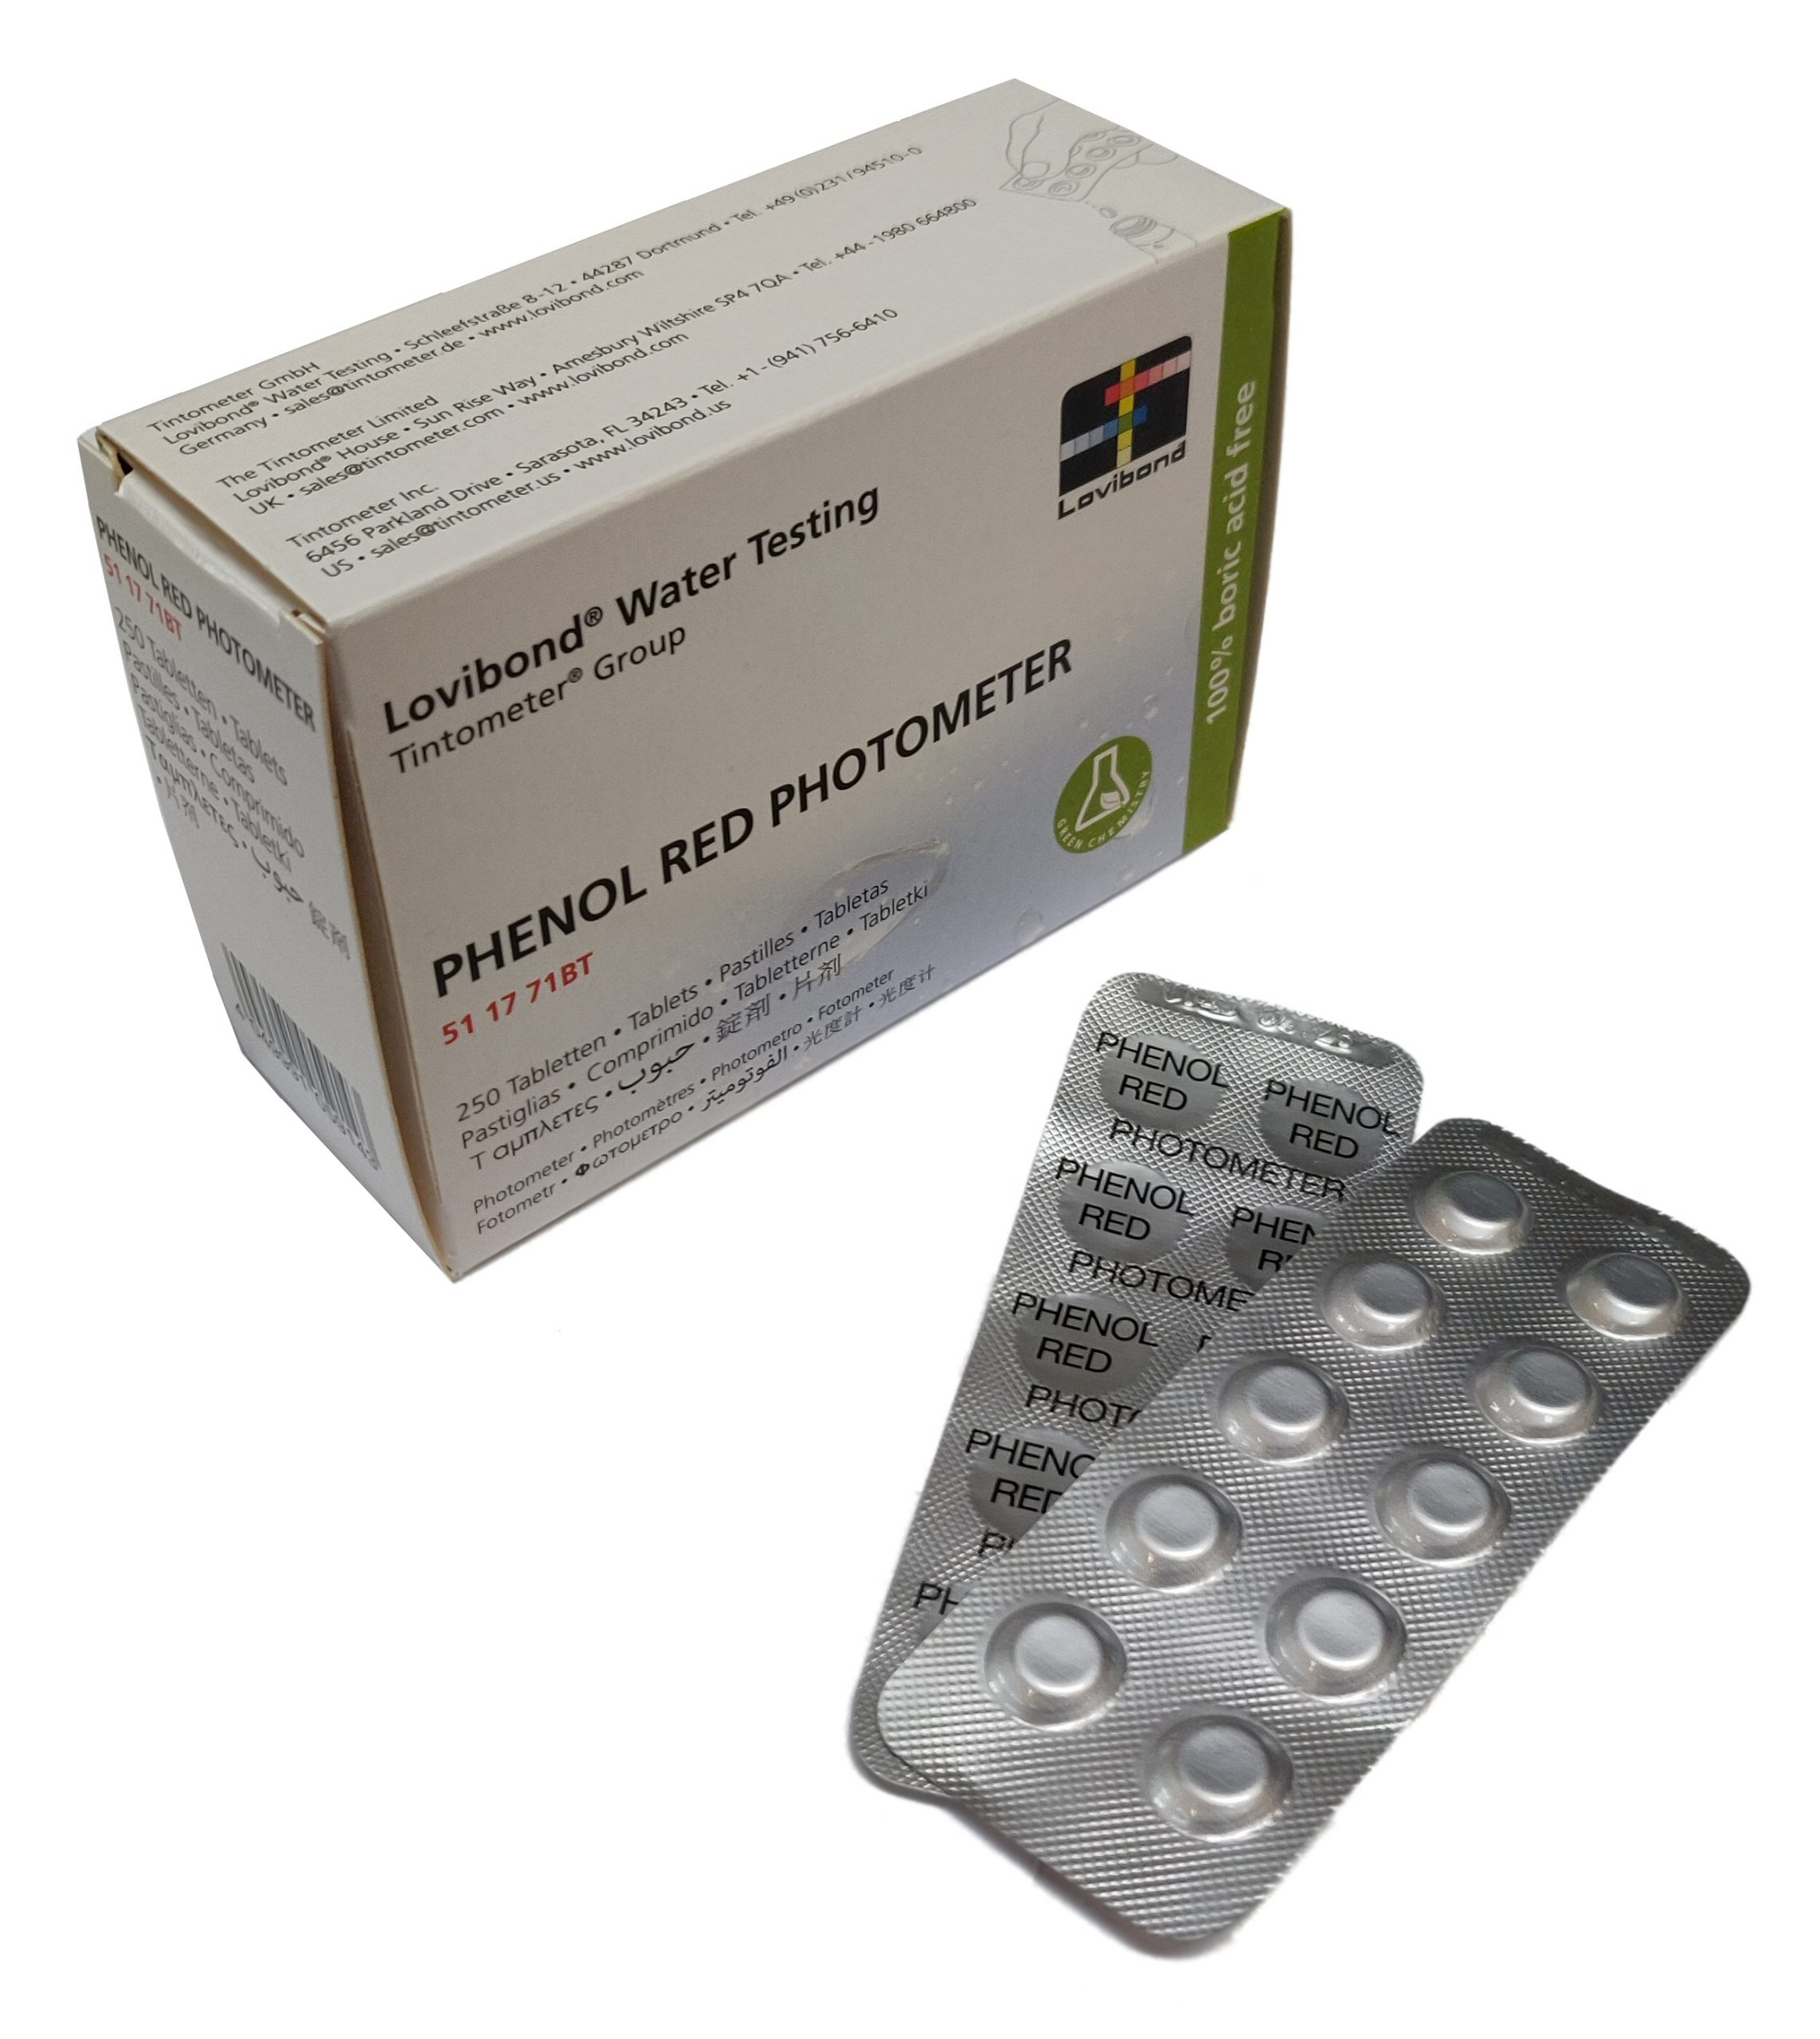 pHenol Red, pH (fotometer)